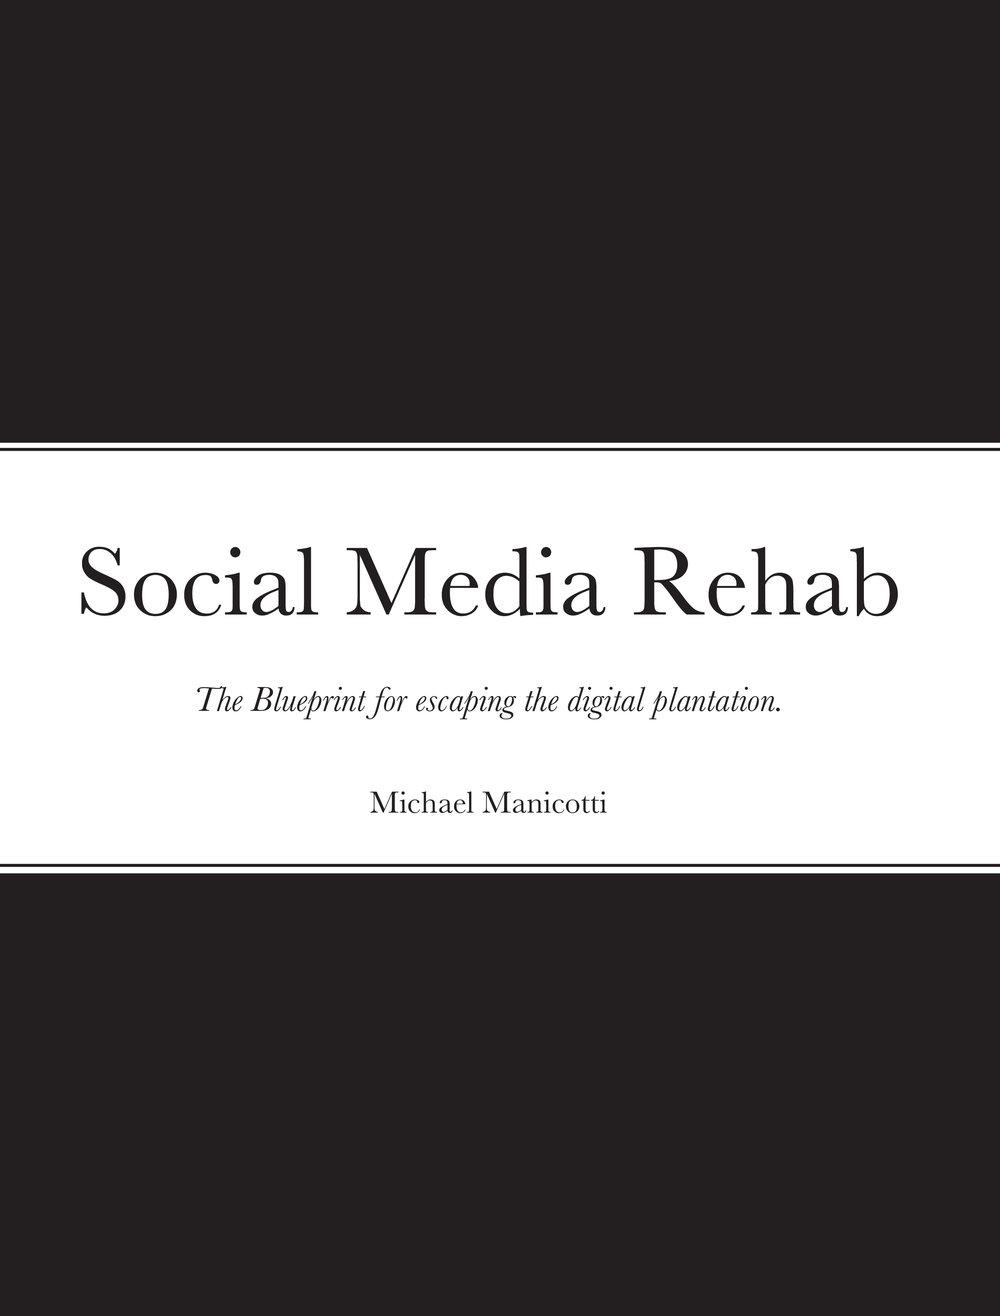 social-media-rehab-the-blueprint-for-escaping-the-digital-plantation-book-cover.jpg